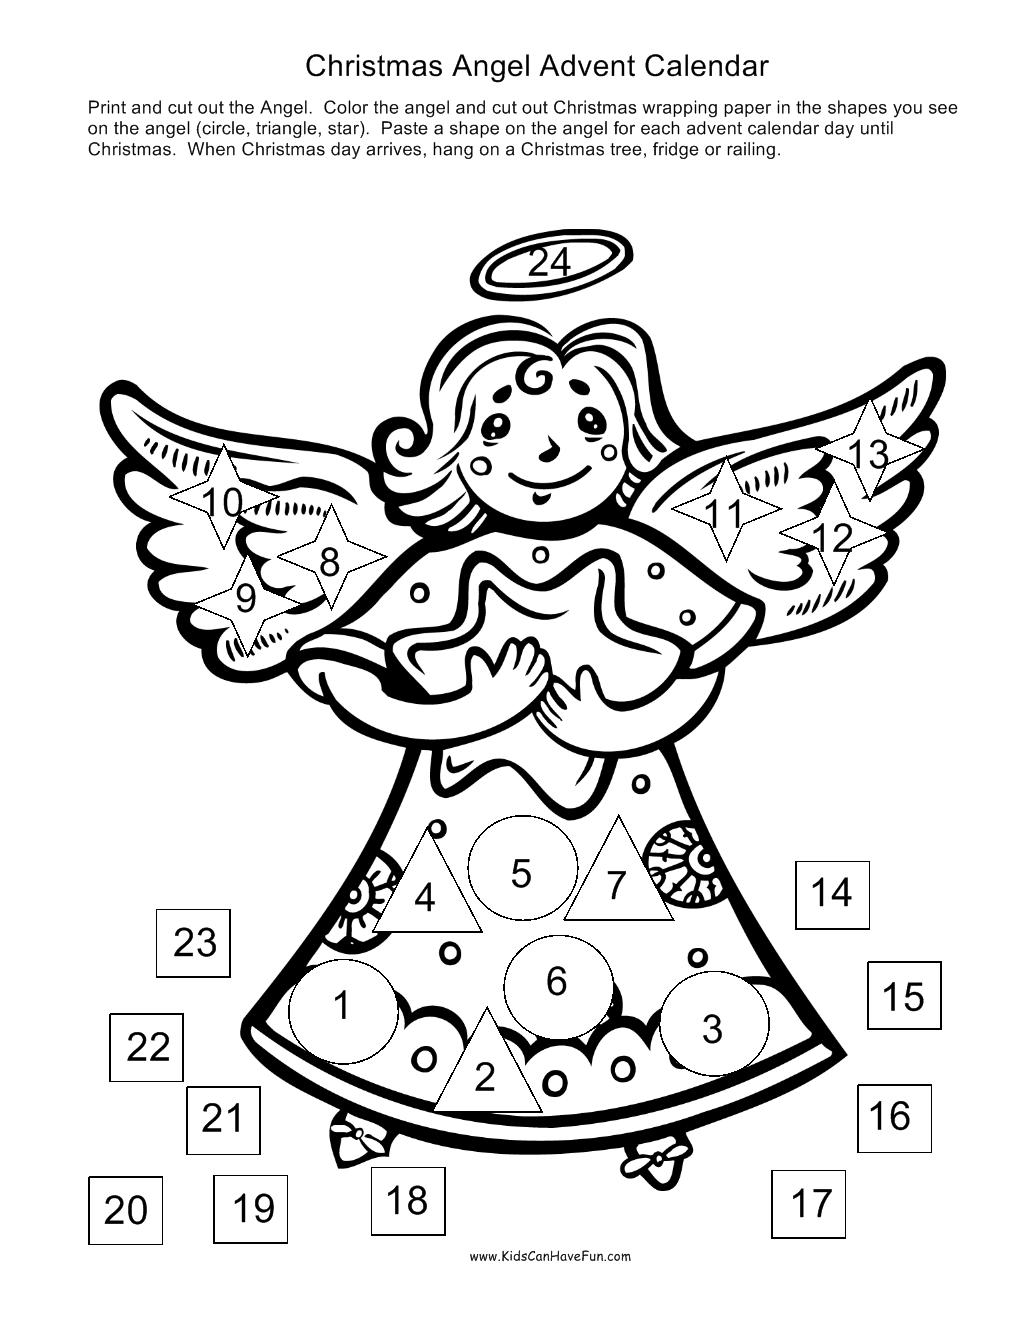 Christmas Advent Angel Calendar Christmas activities